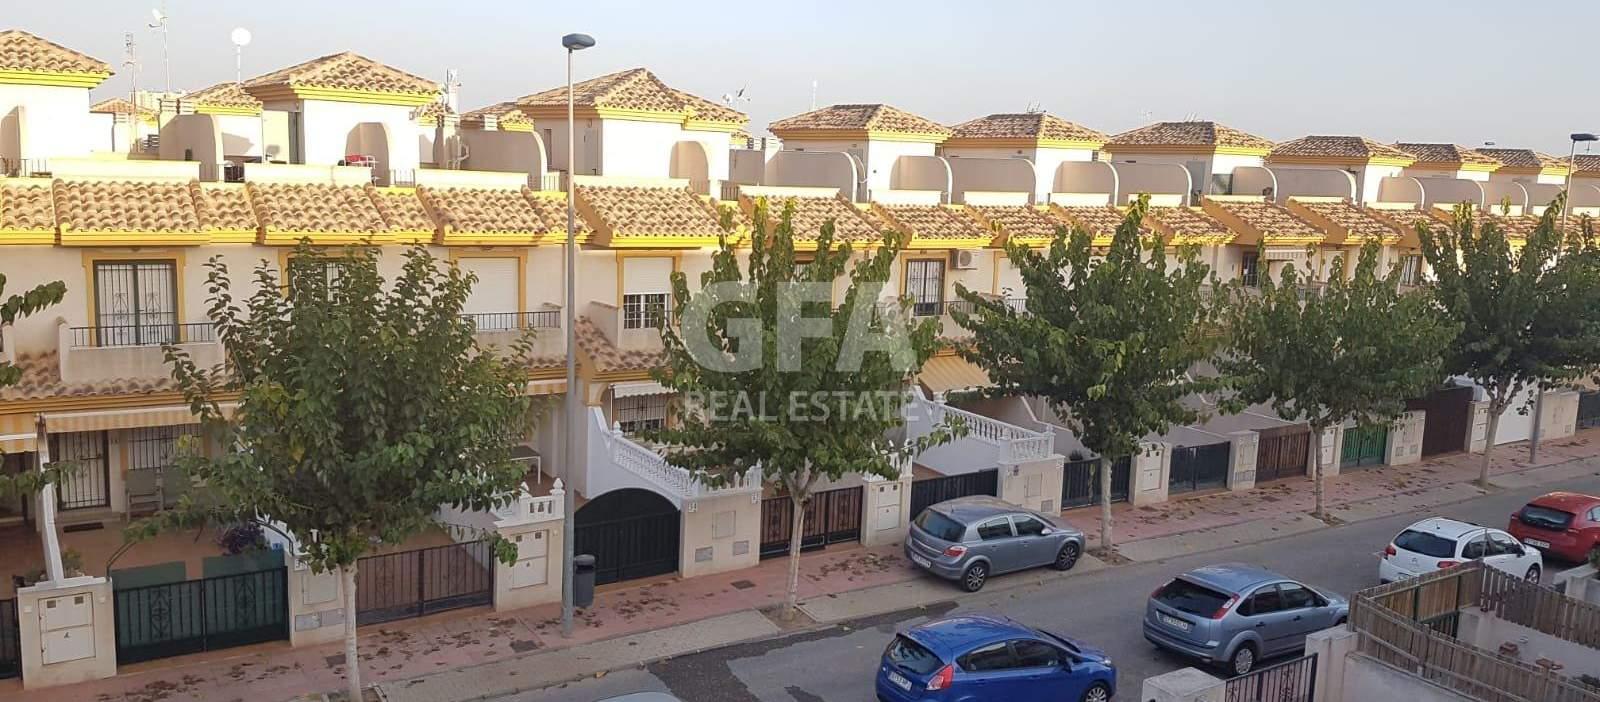 Casa Adosada en San Javier (Murcia)